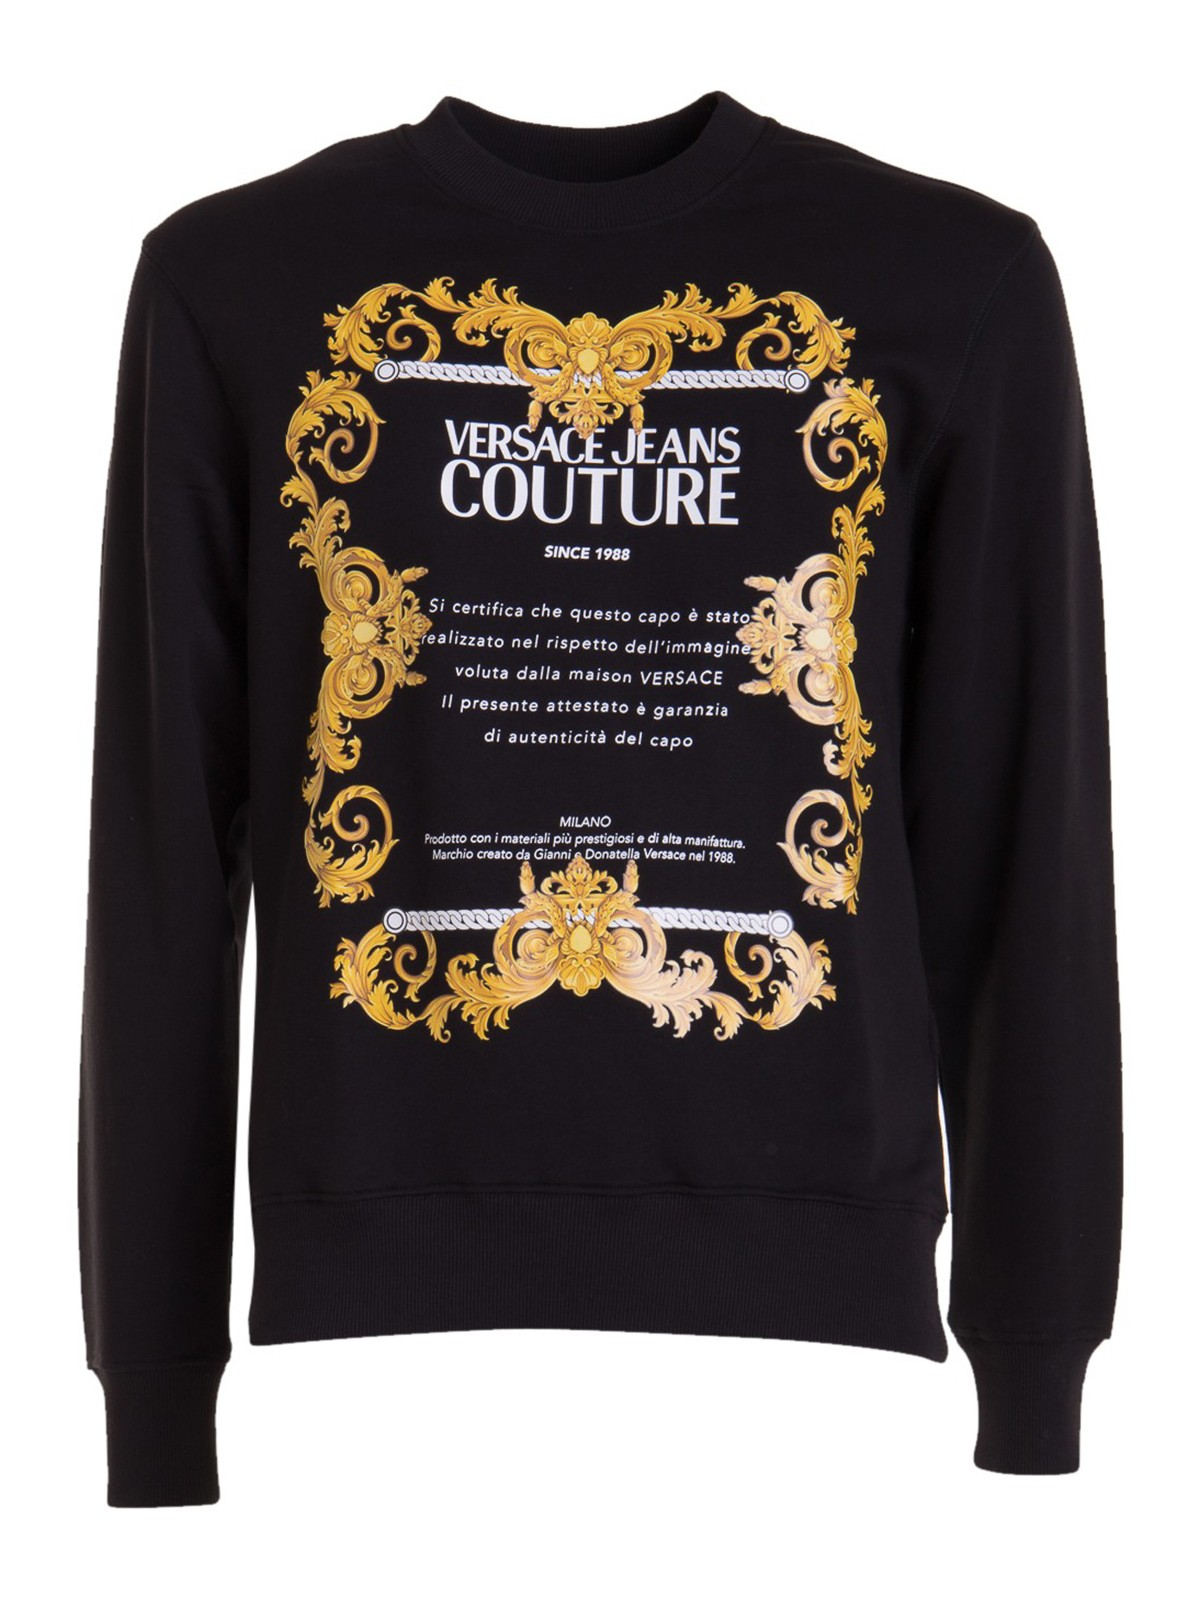 Versace Jeans Couture LOGO CREWNECK SWEATSHIRT